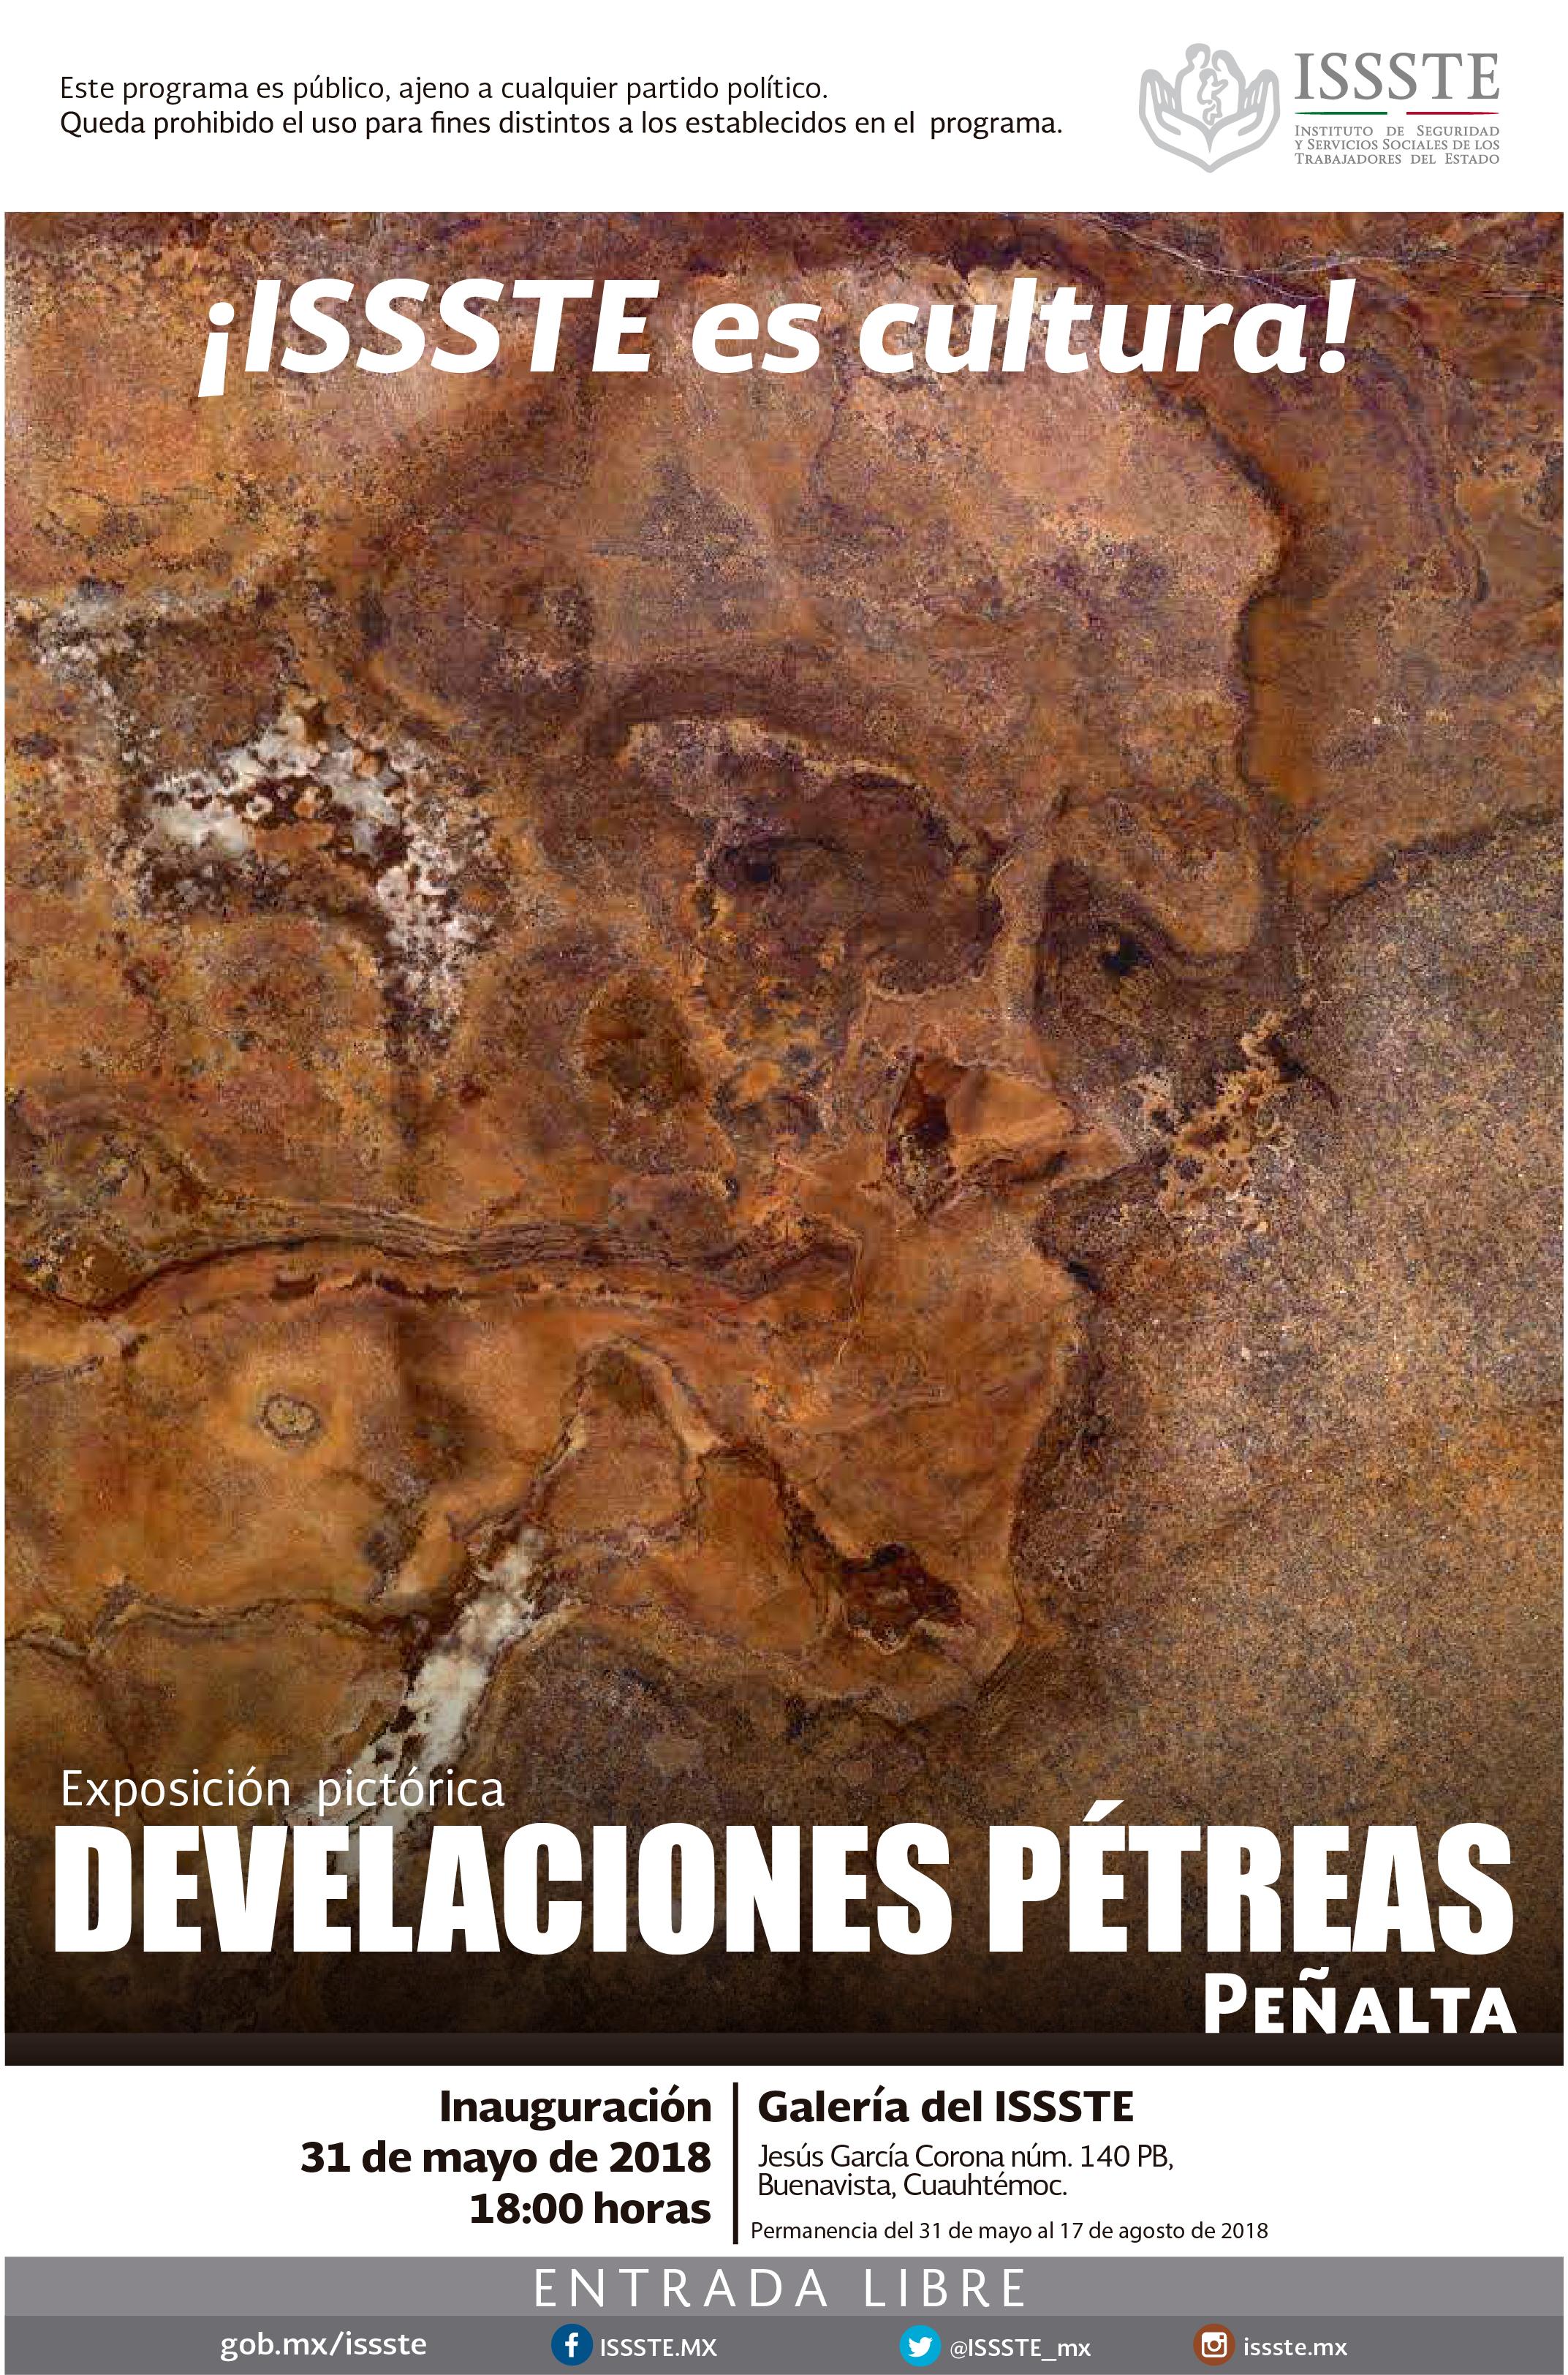 Invi expo Develaciones pétreas-Galeria ISSSTE.jpg